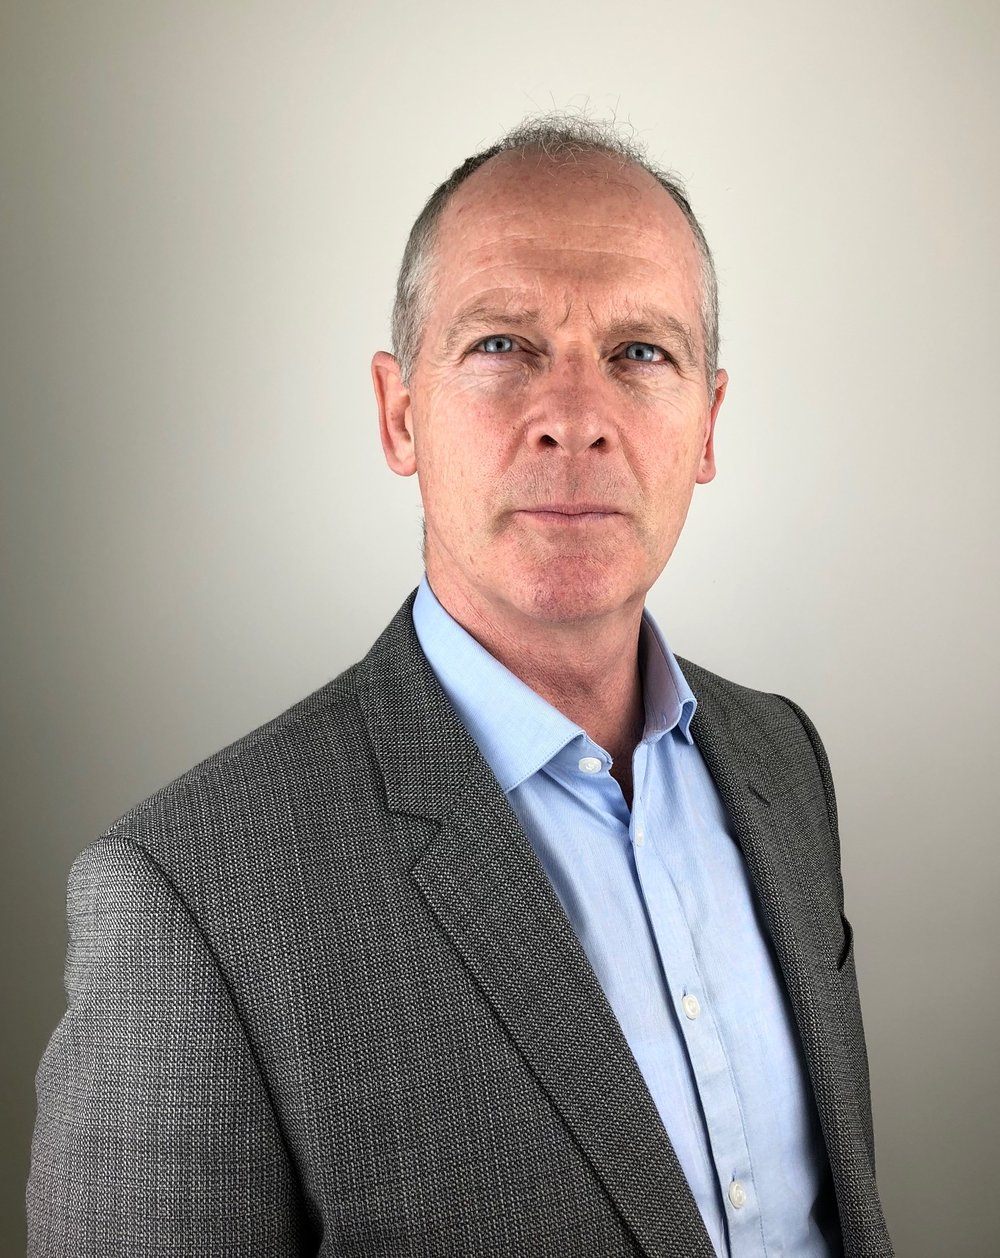 Managing Director - Gerard MartinMobile; 0862581058Phone; (01) 4533952Email; gerard@mccreery.ie